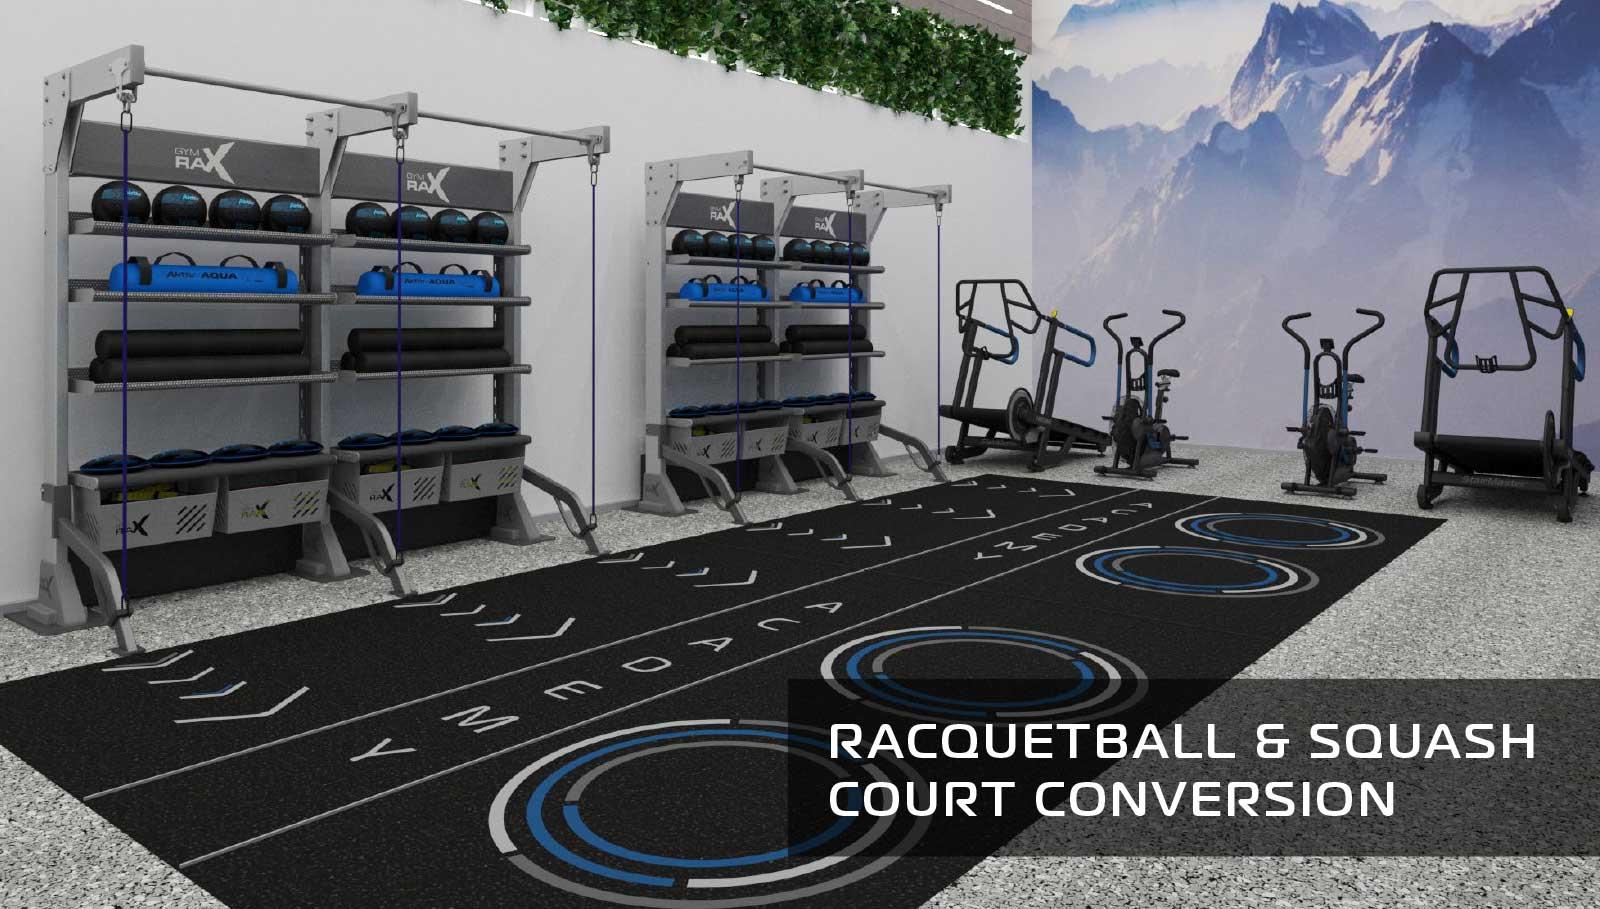 RAQUETBALL & SQUASH COURT CONVERSIONS